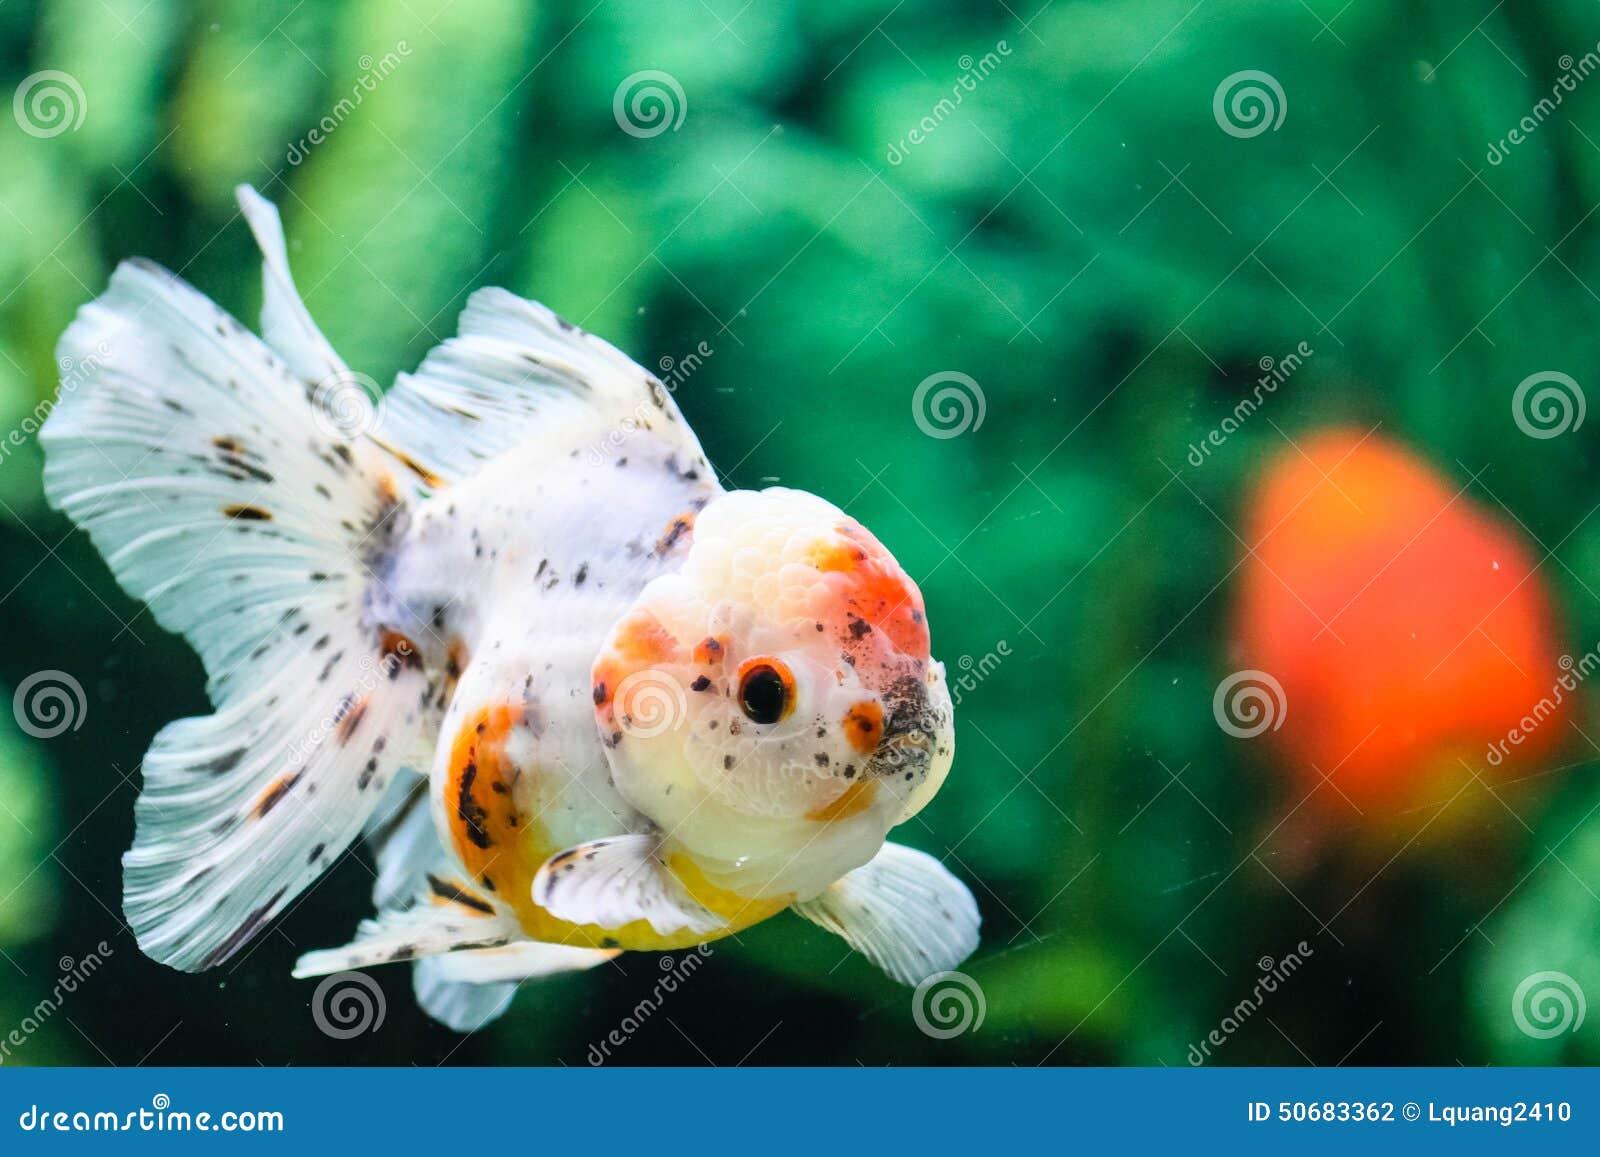 Download 关闭在水族馆的金鱼 库存照片. 图片 包括有 移动, 水生, 水族馆, 敌意, beauvoir, 孤独 - 50683362